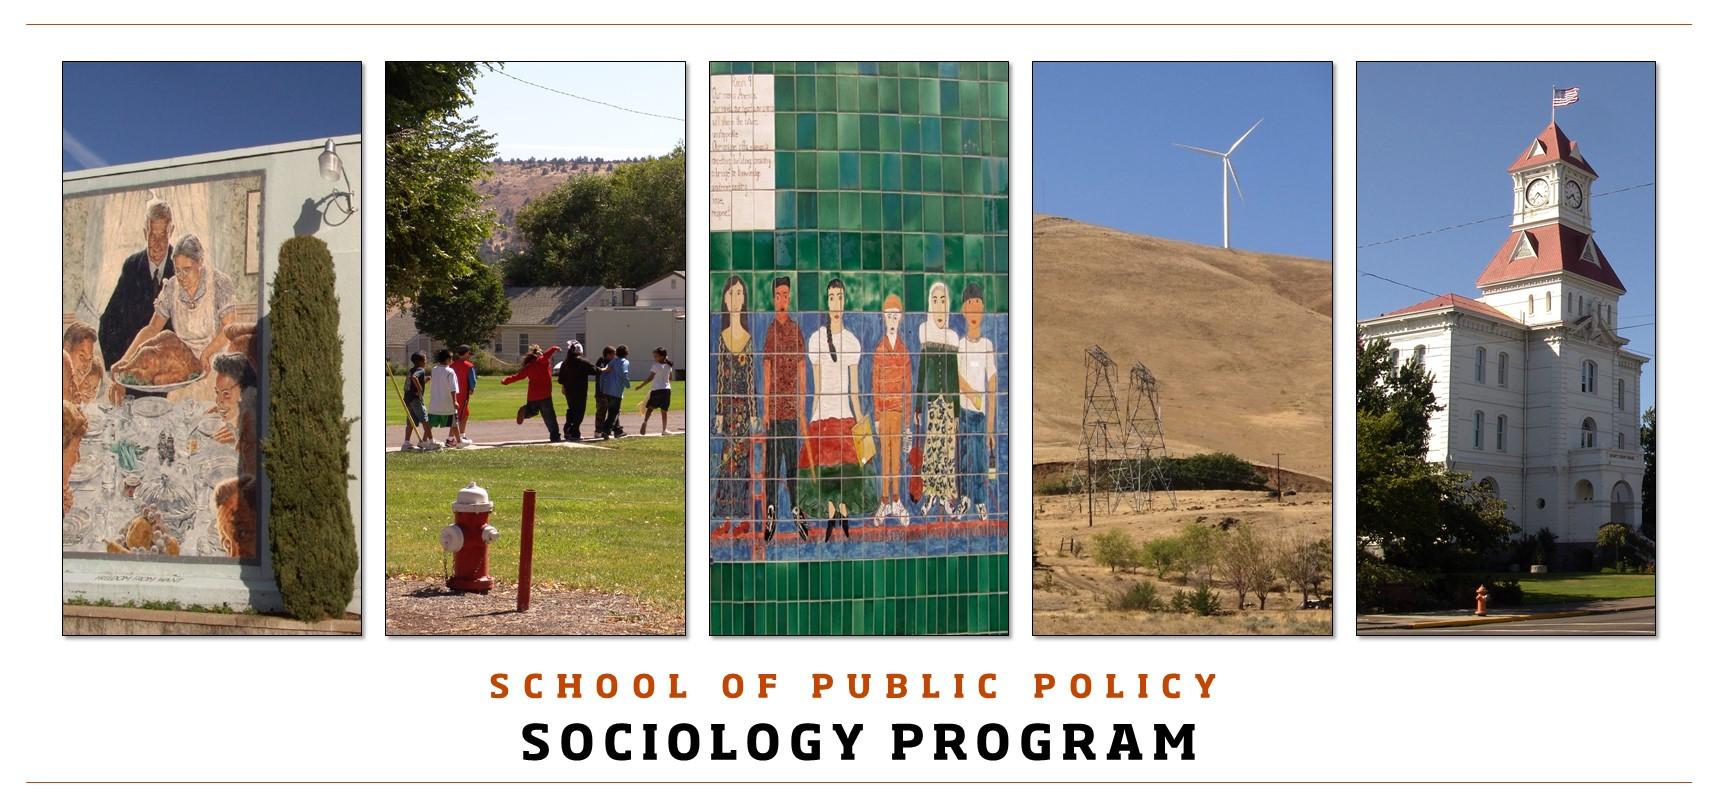 School of Public Policy Sociology Program